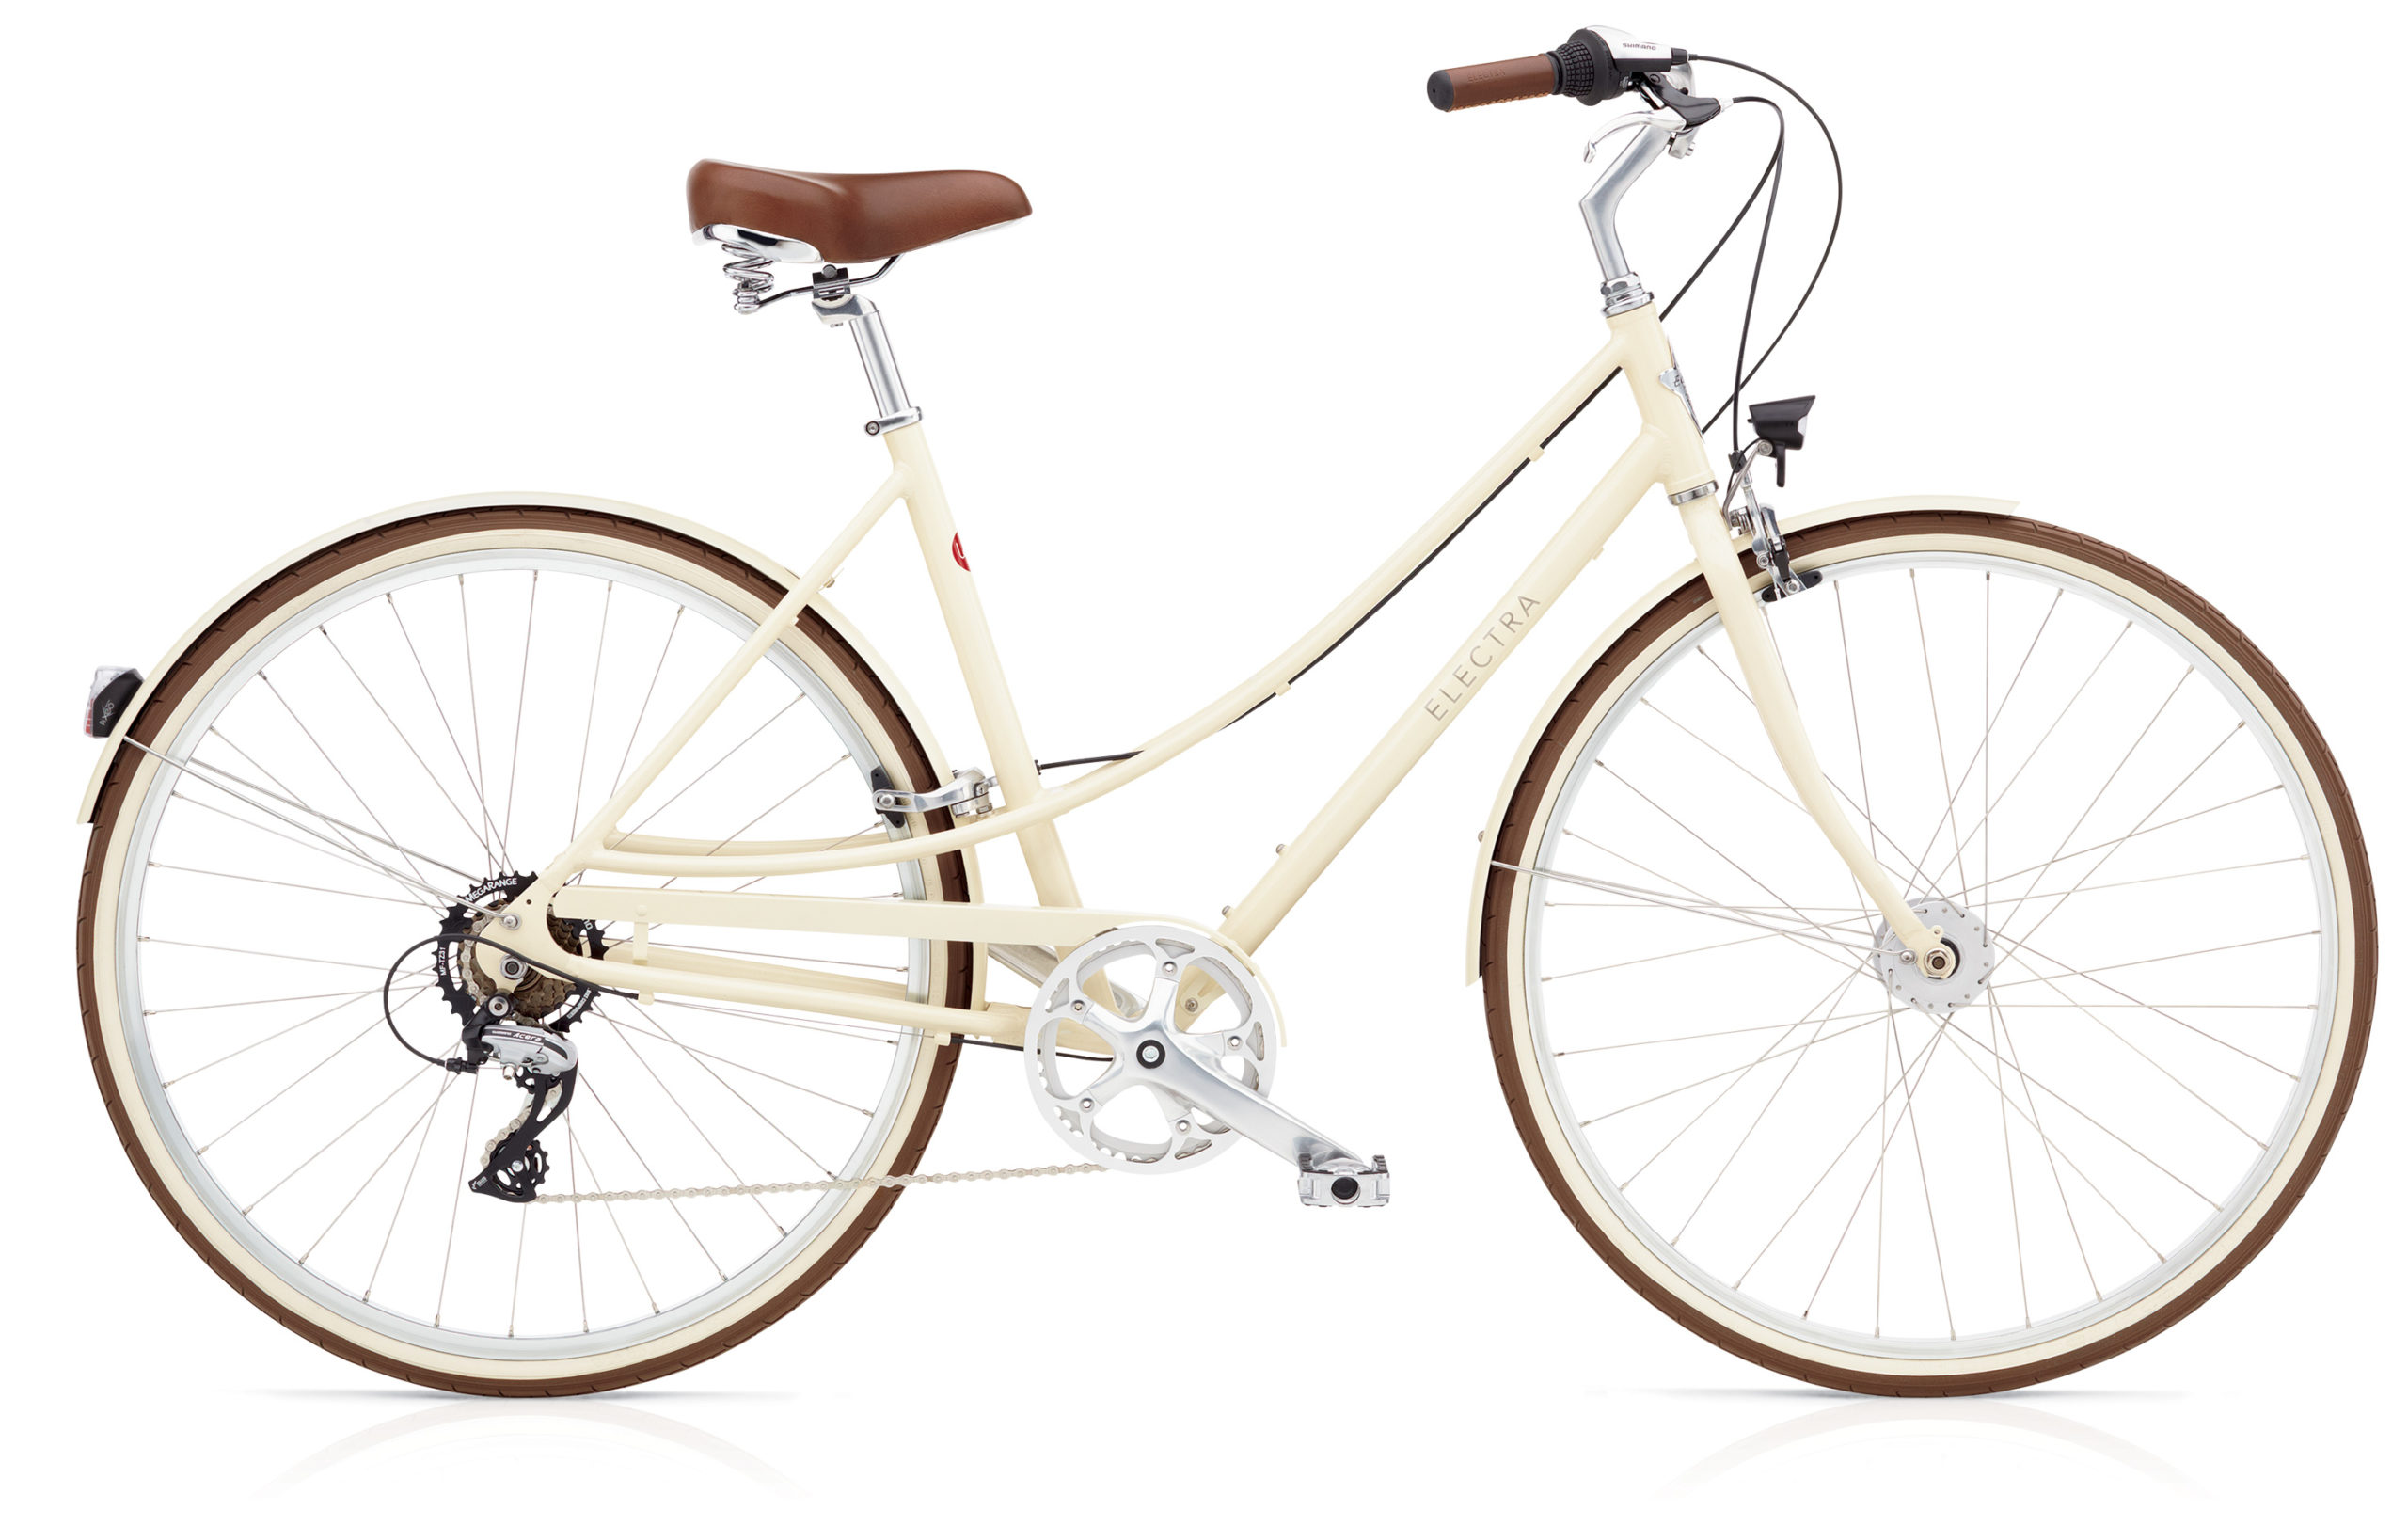 Bike, £450, Electra Bicycle Company